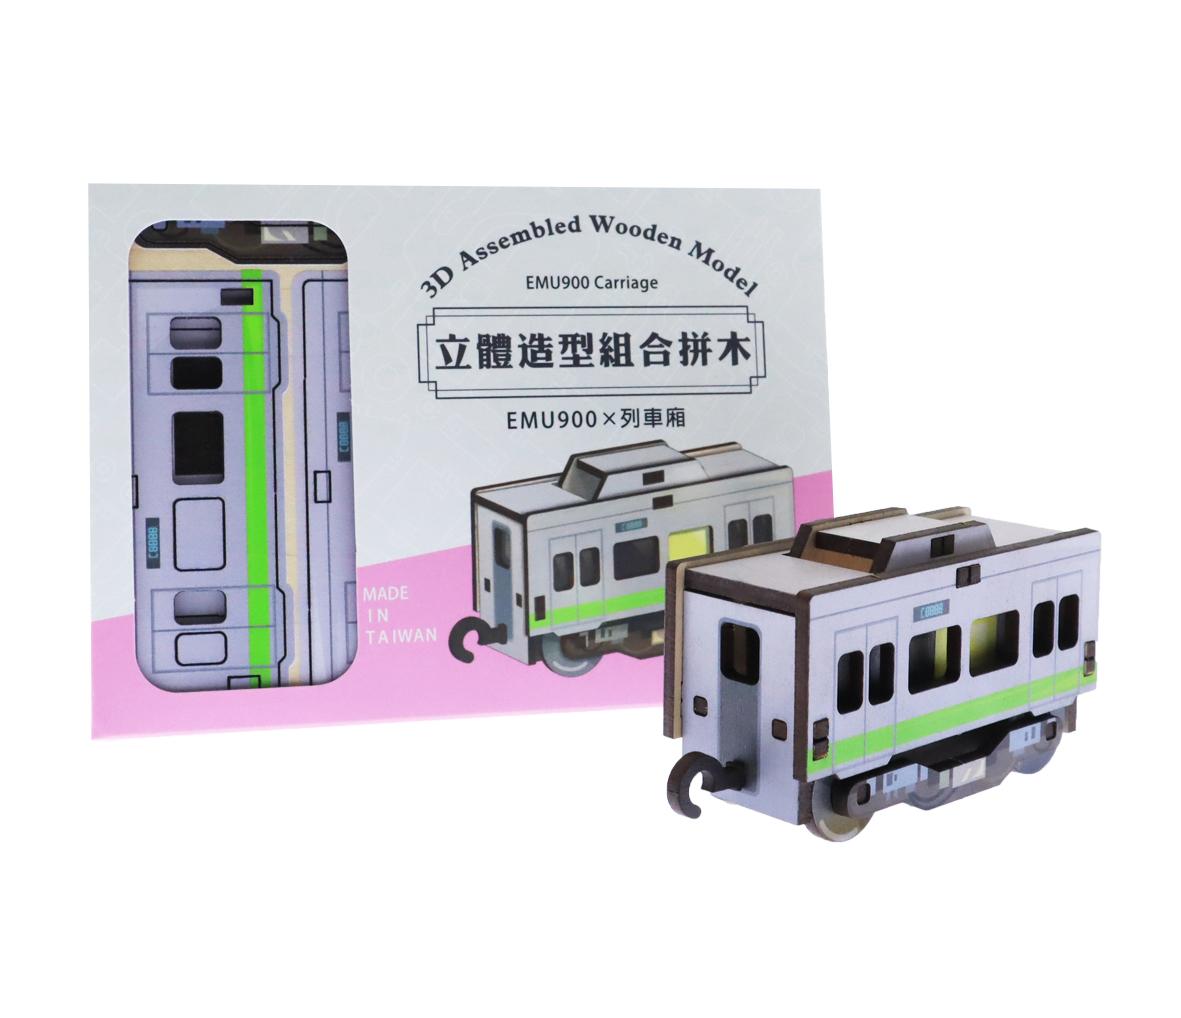 EMU900車廂立體組合拼木